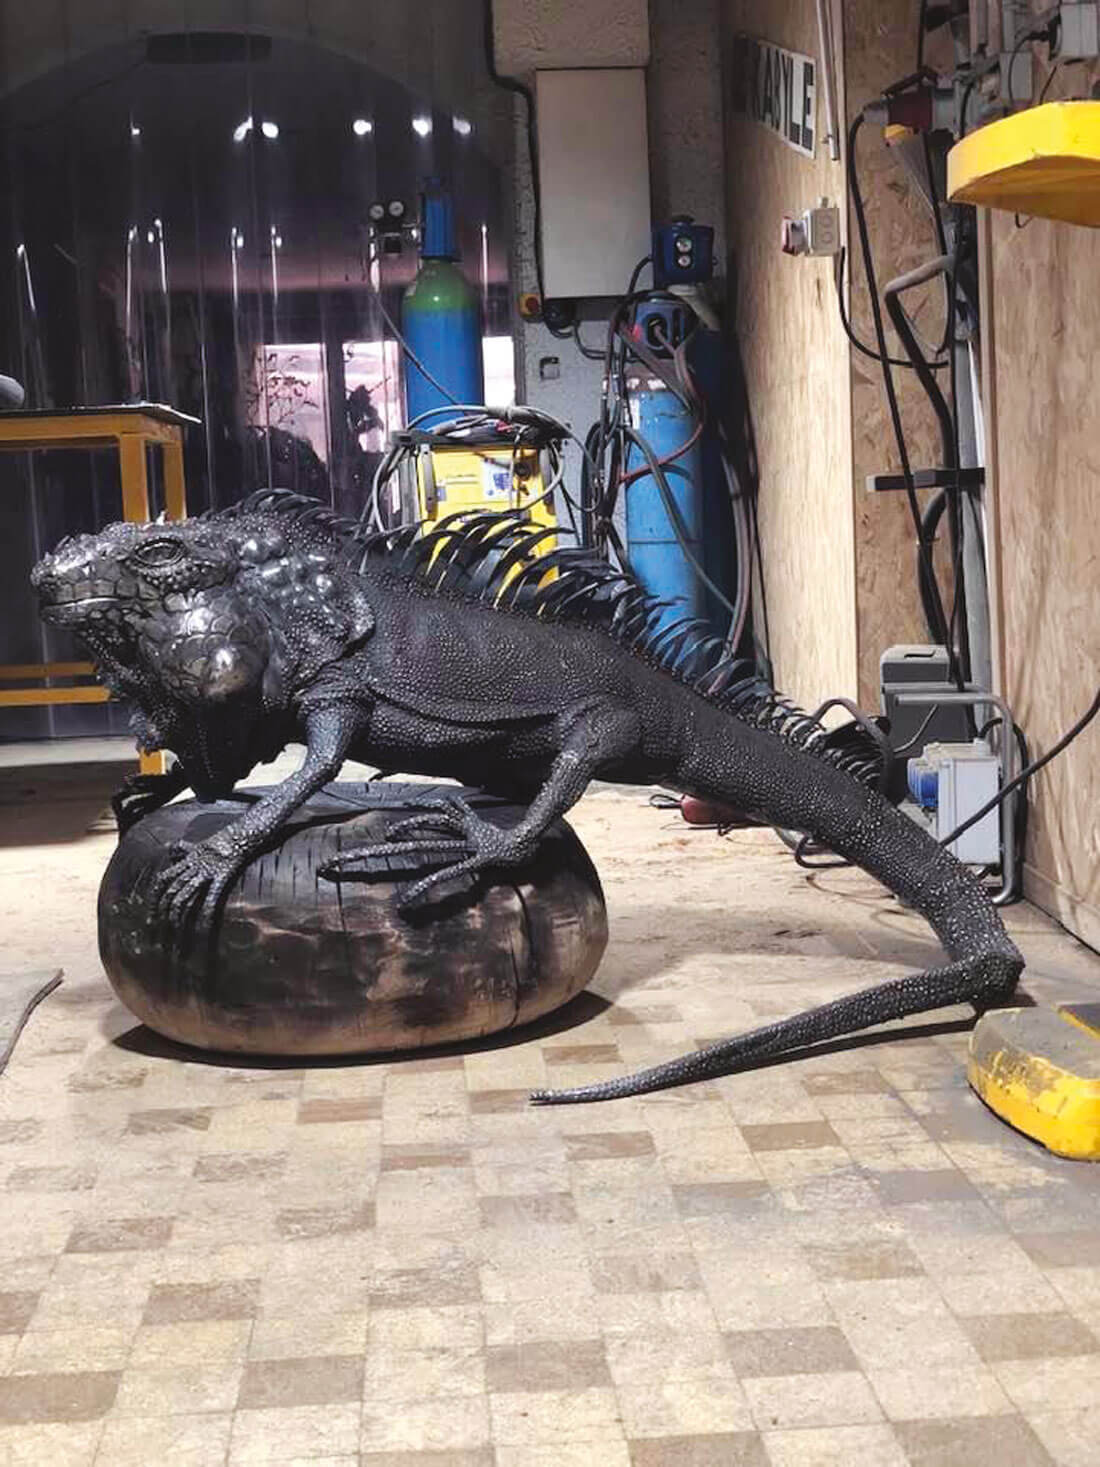 2021 09 tendances interieur franck koob sculpture 10